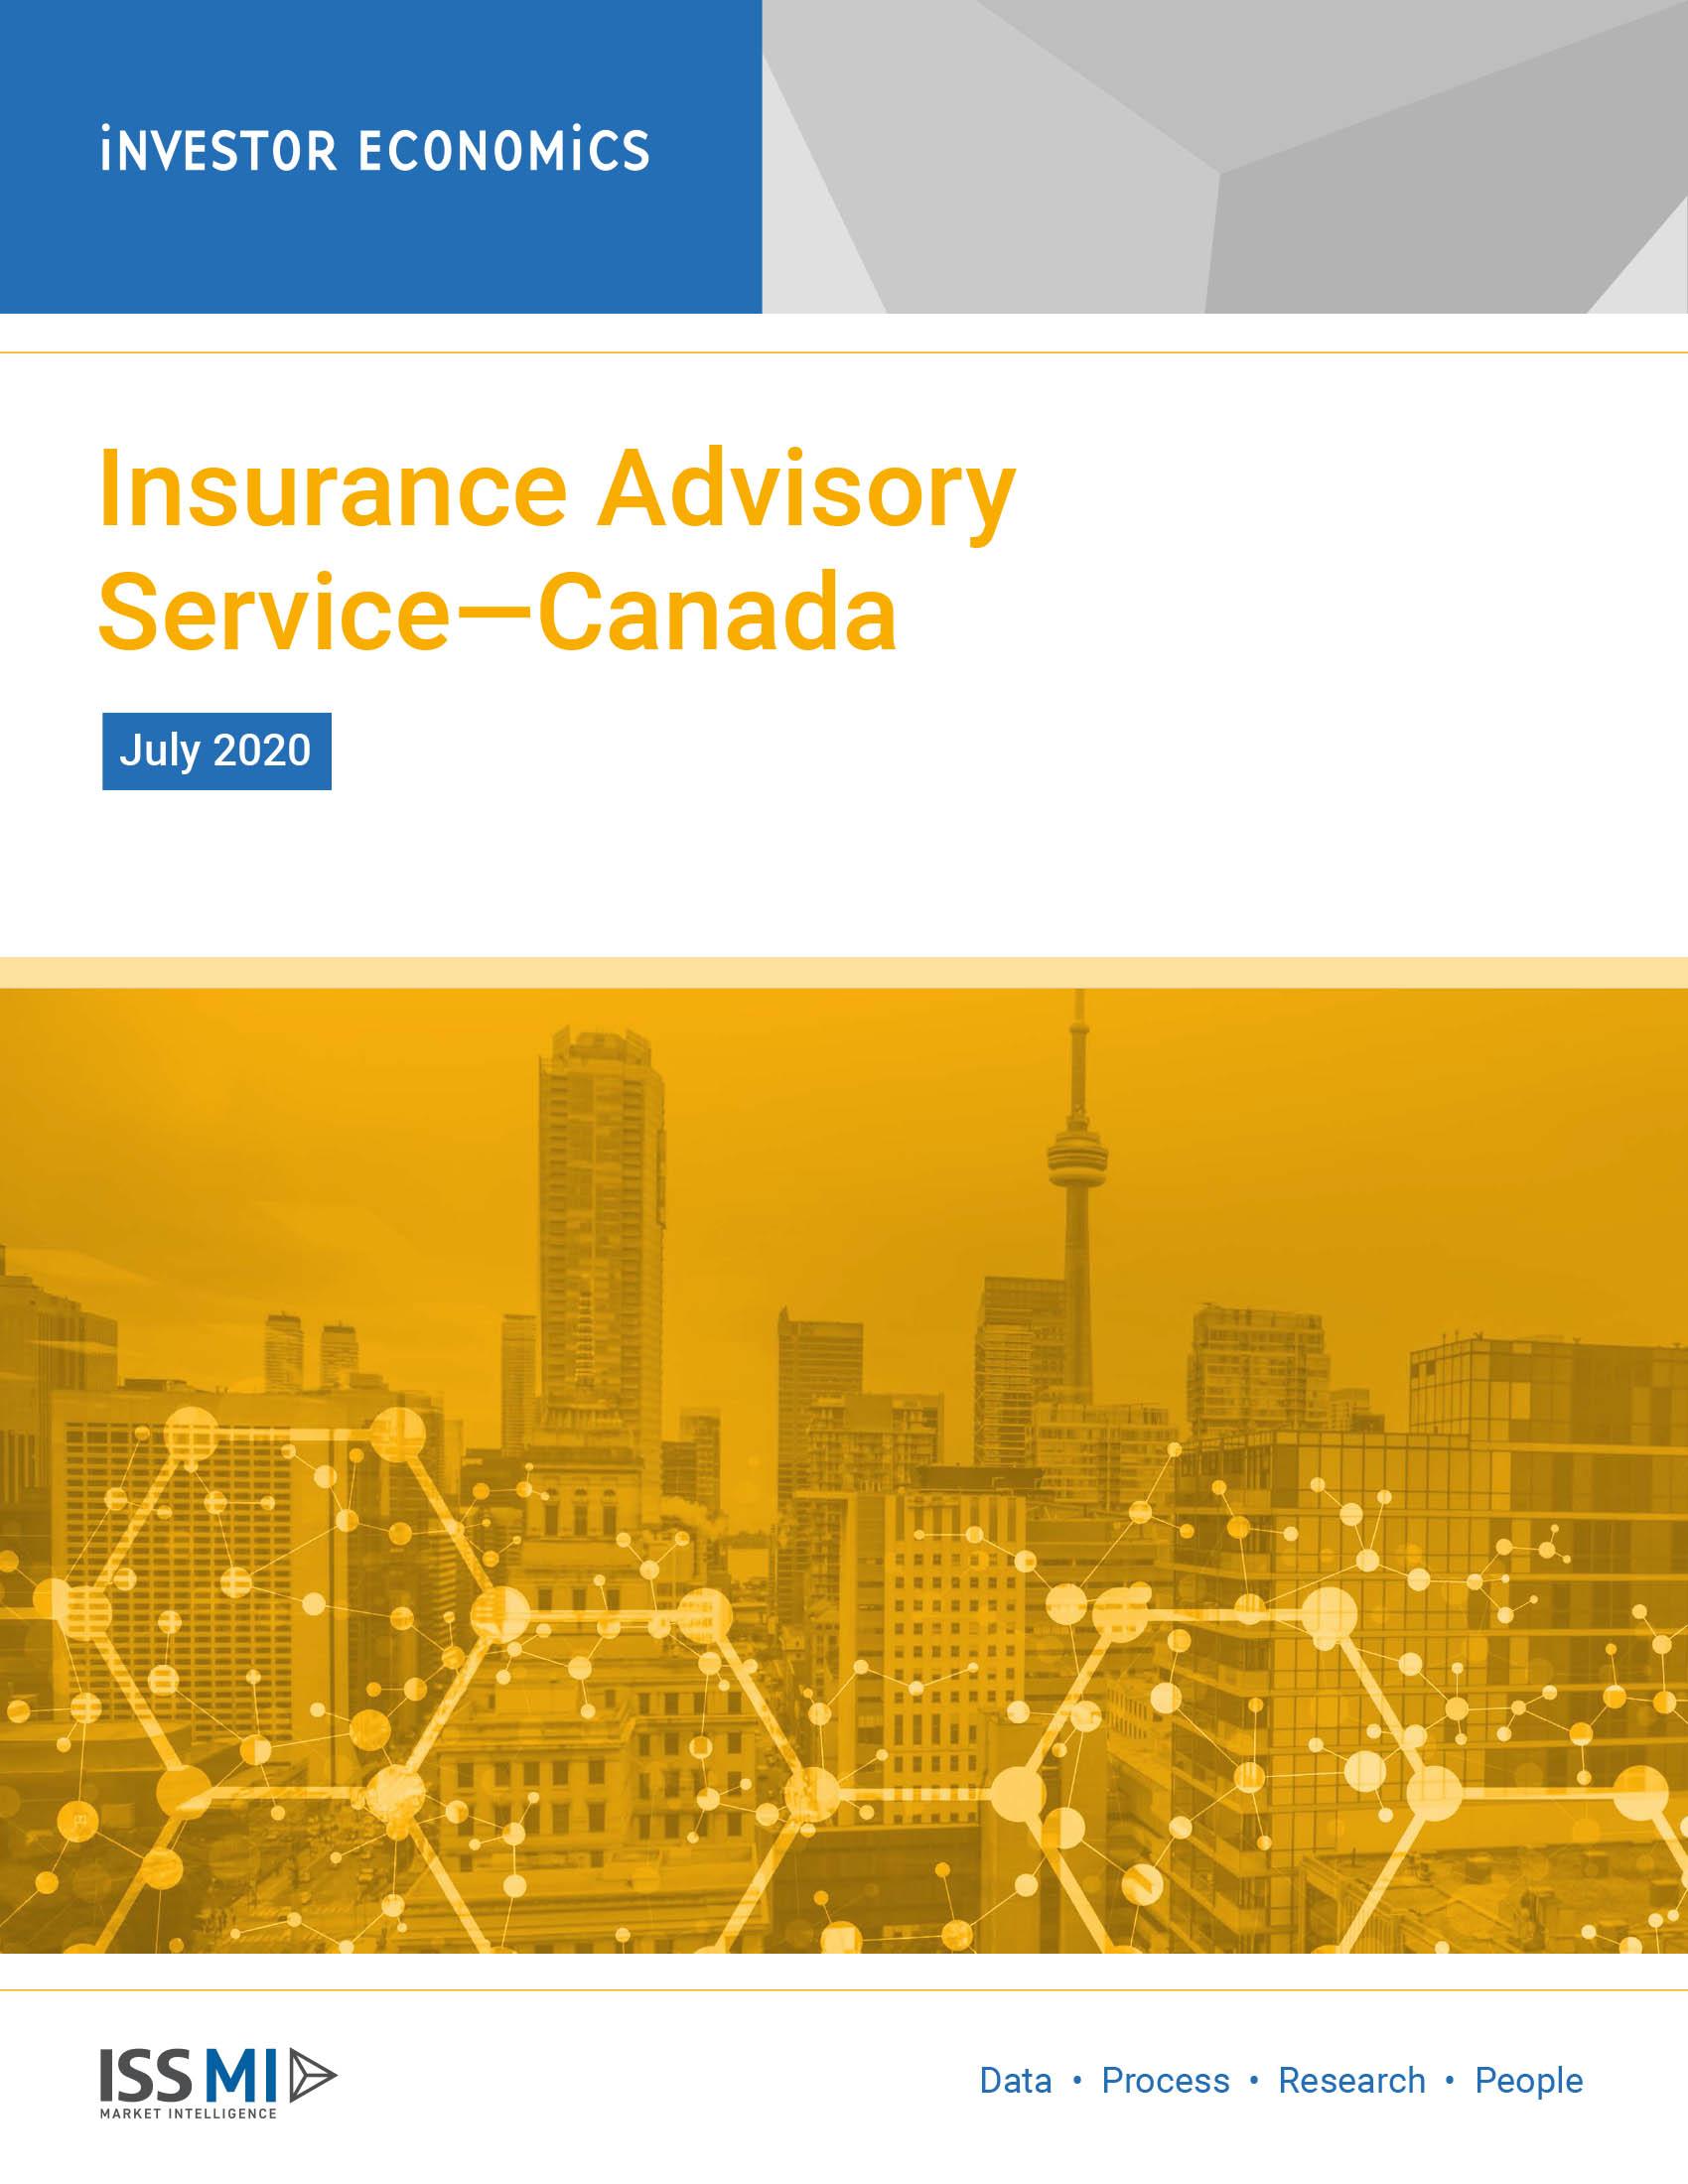 Insurance Advisory Service July 2020